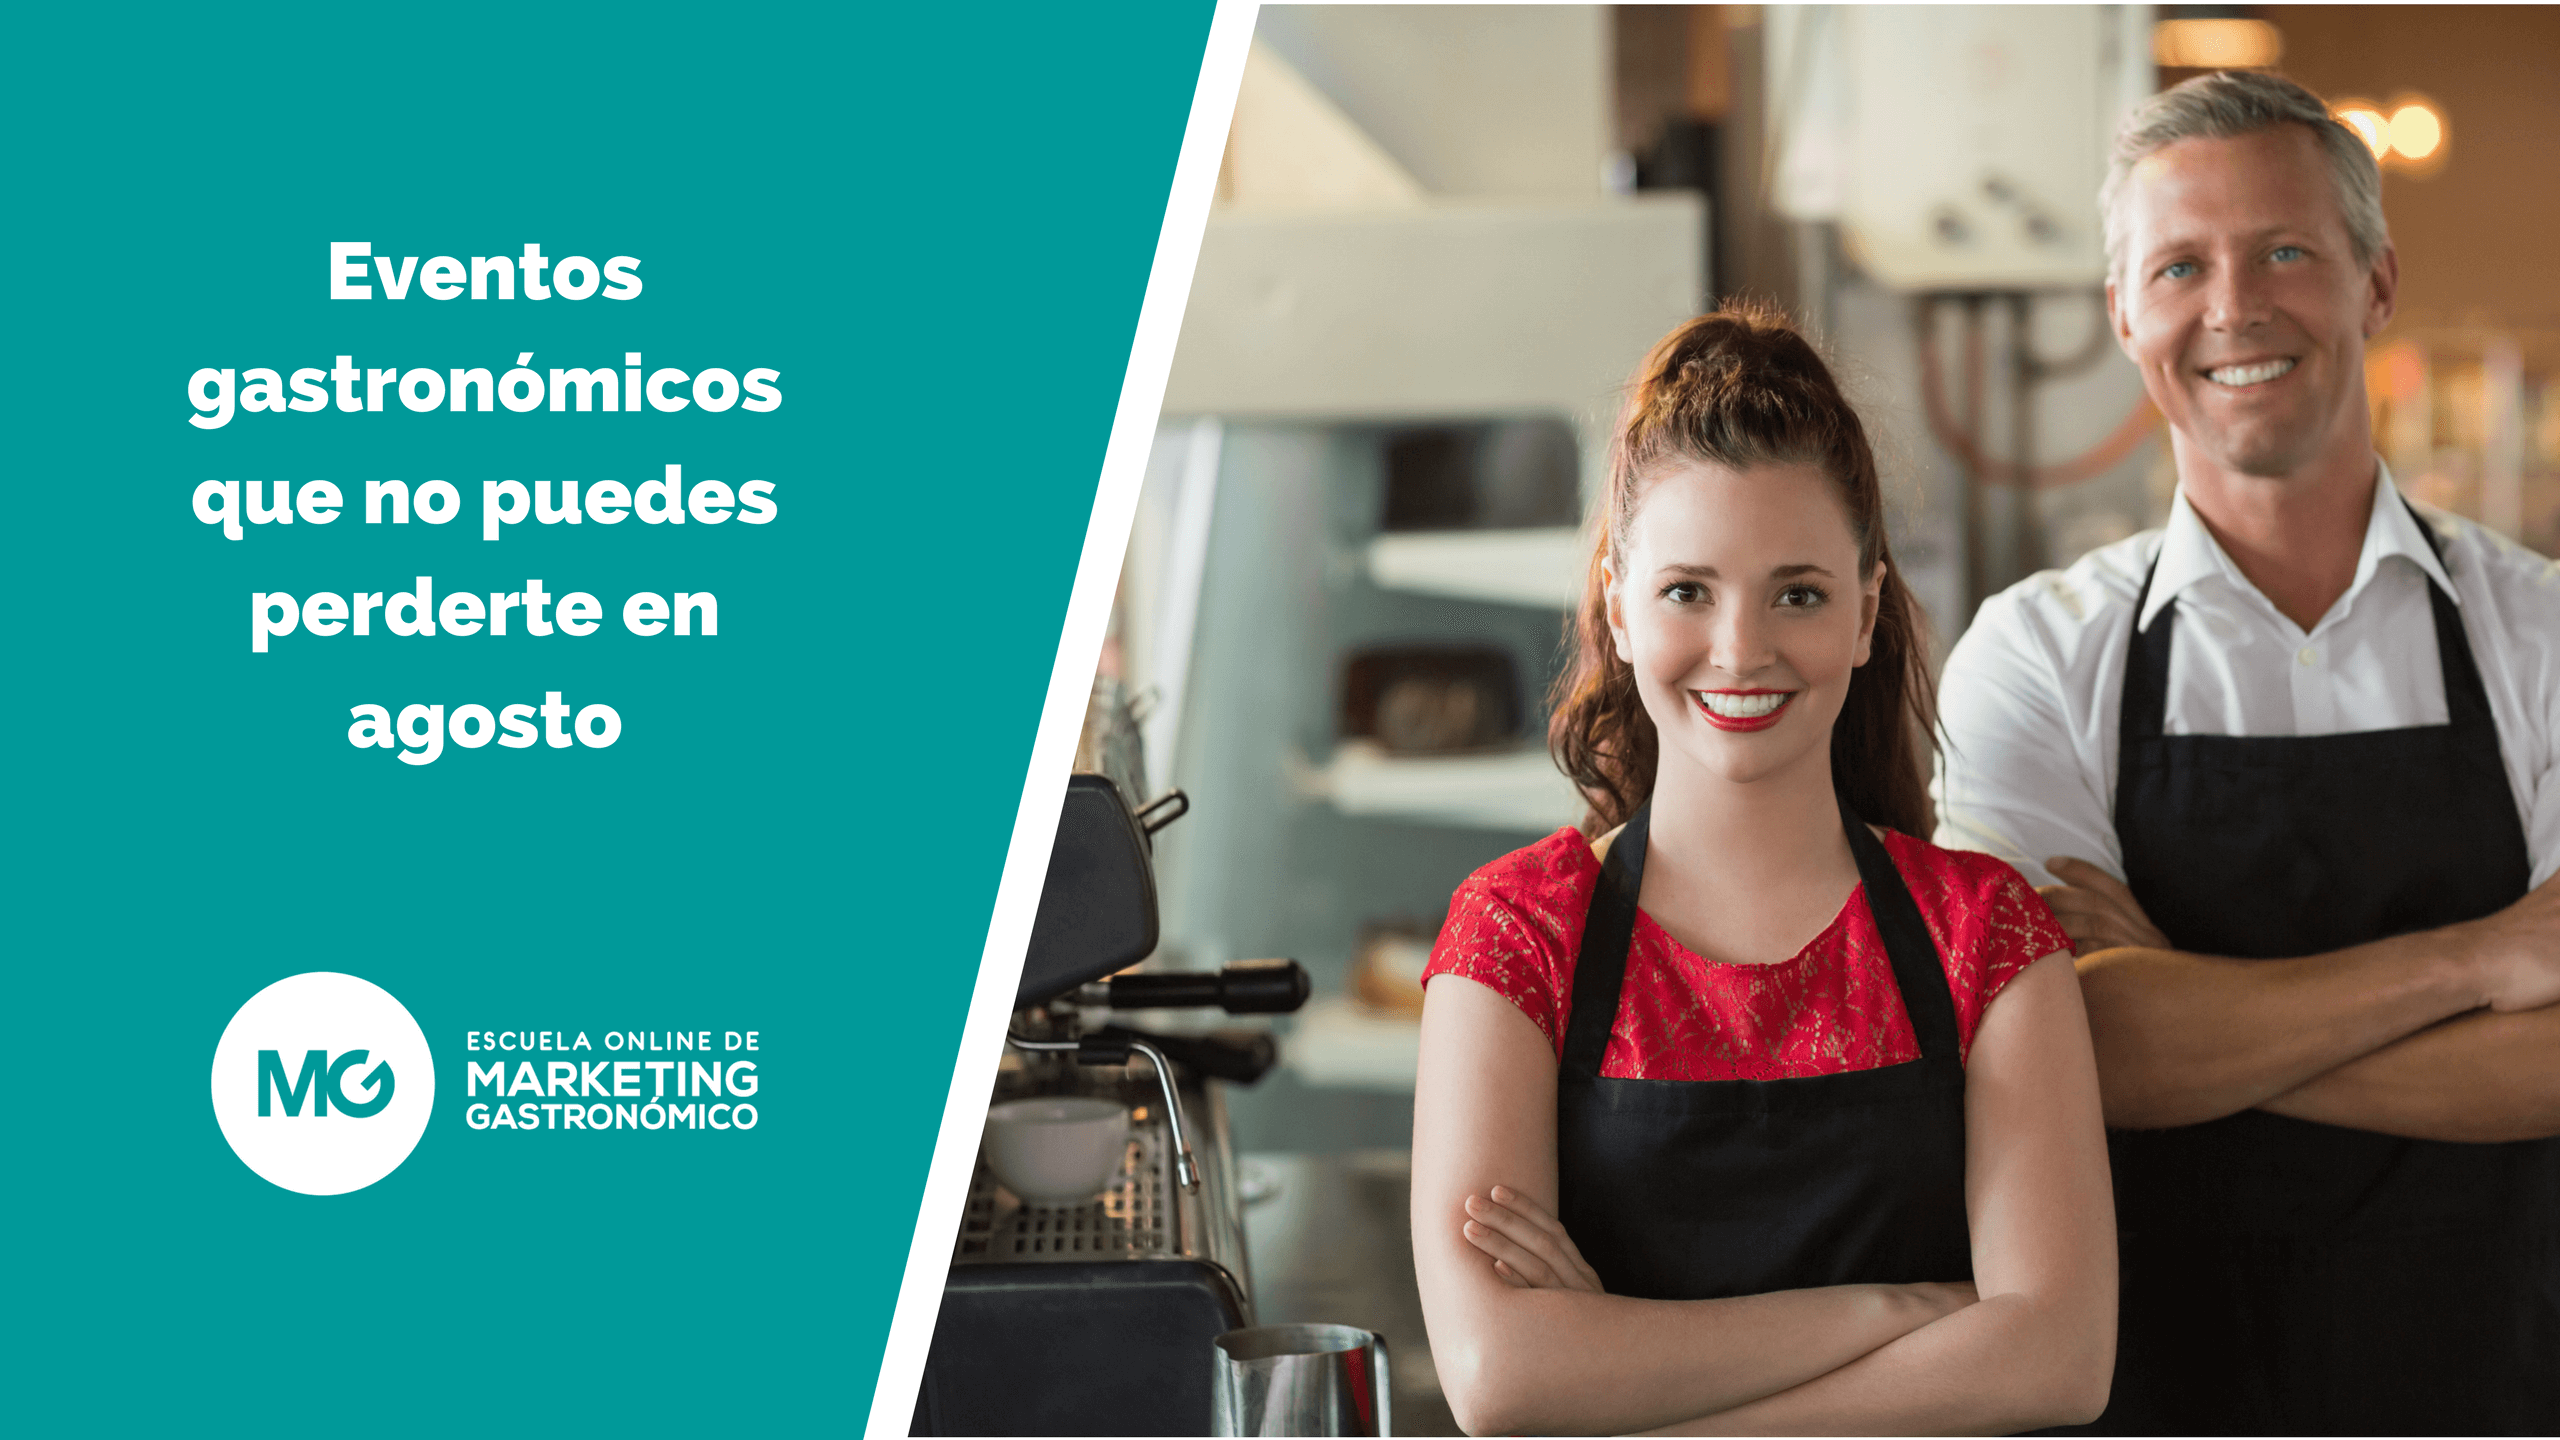 marketing gastronómico erika silva